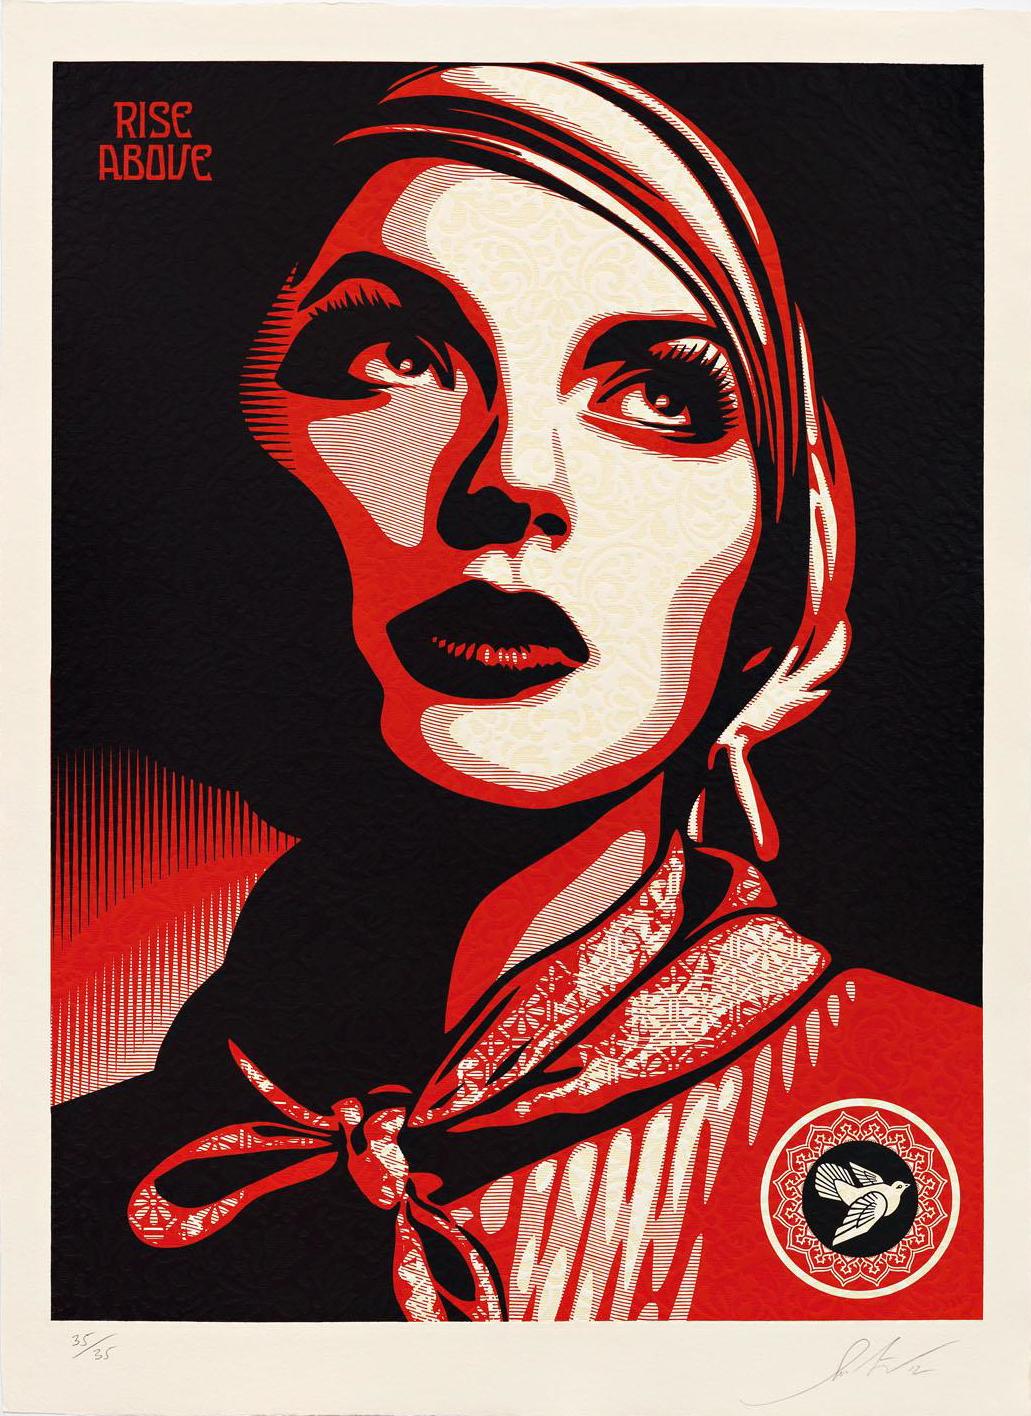 Famous Graphic Designer Series: Shepard Fairey | Go Ask Alice